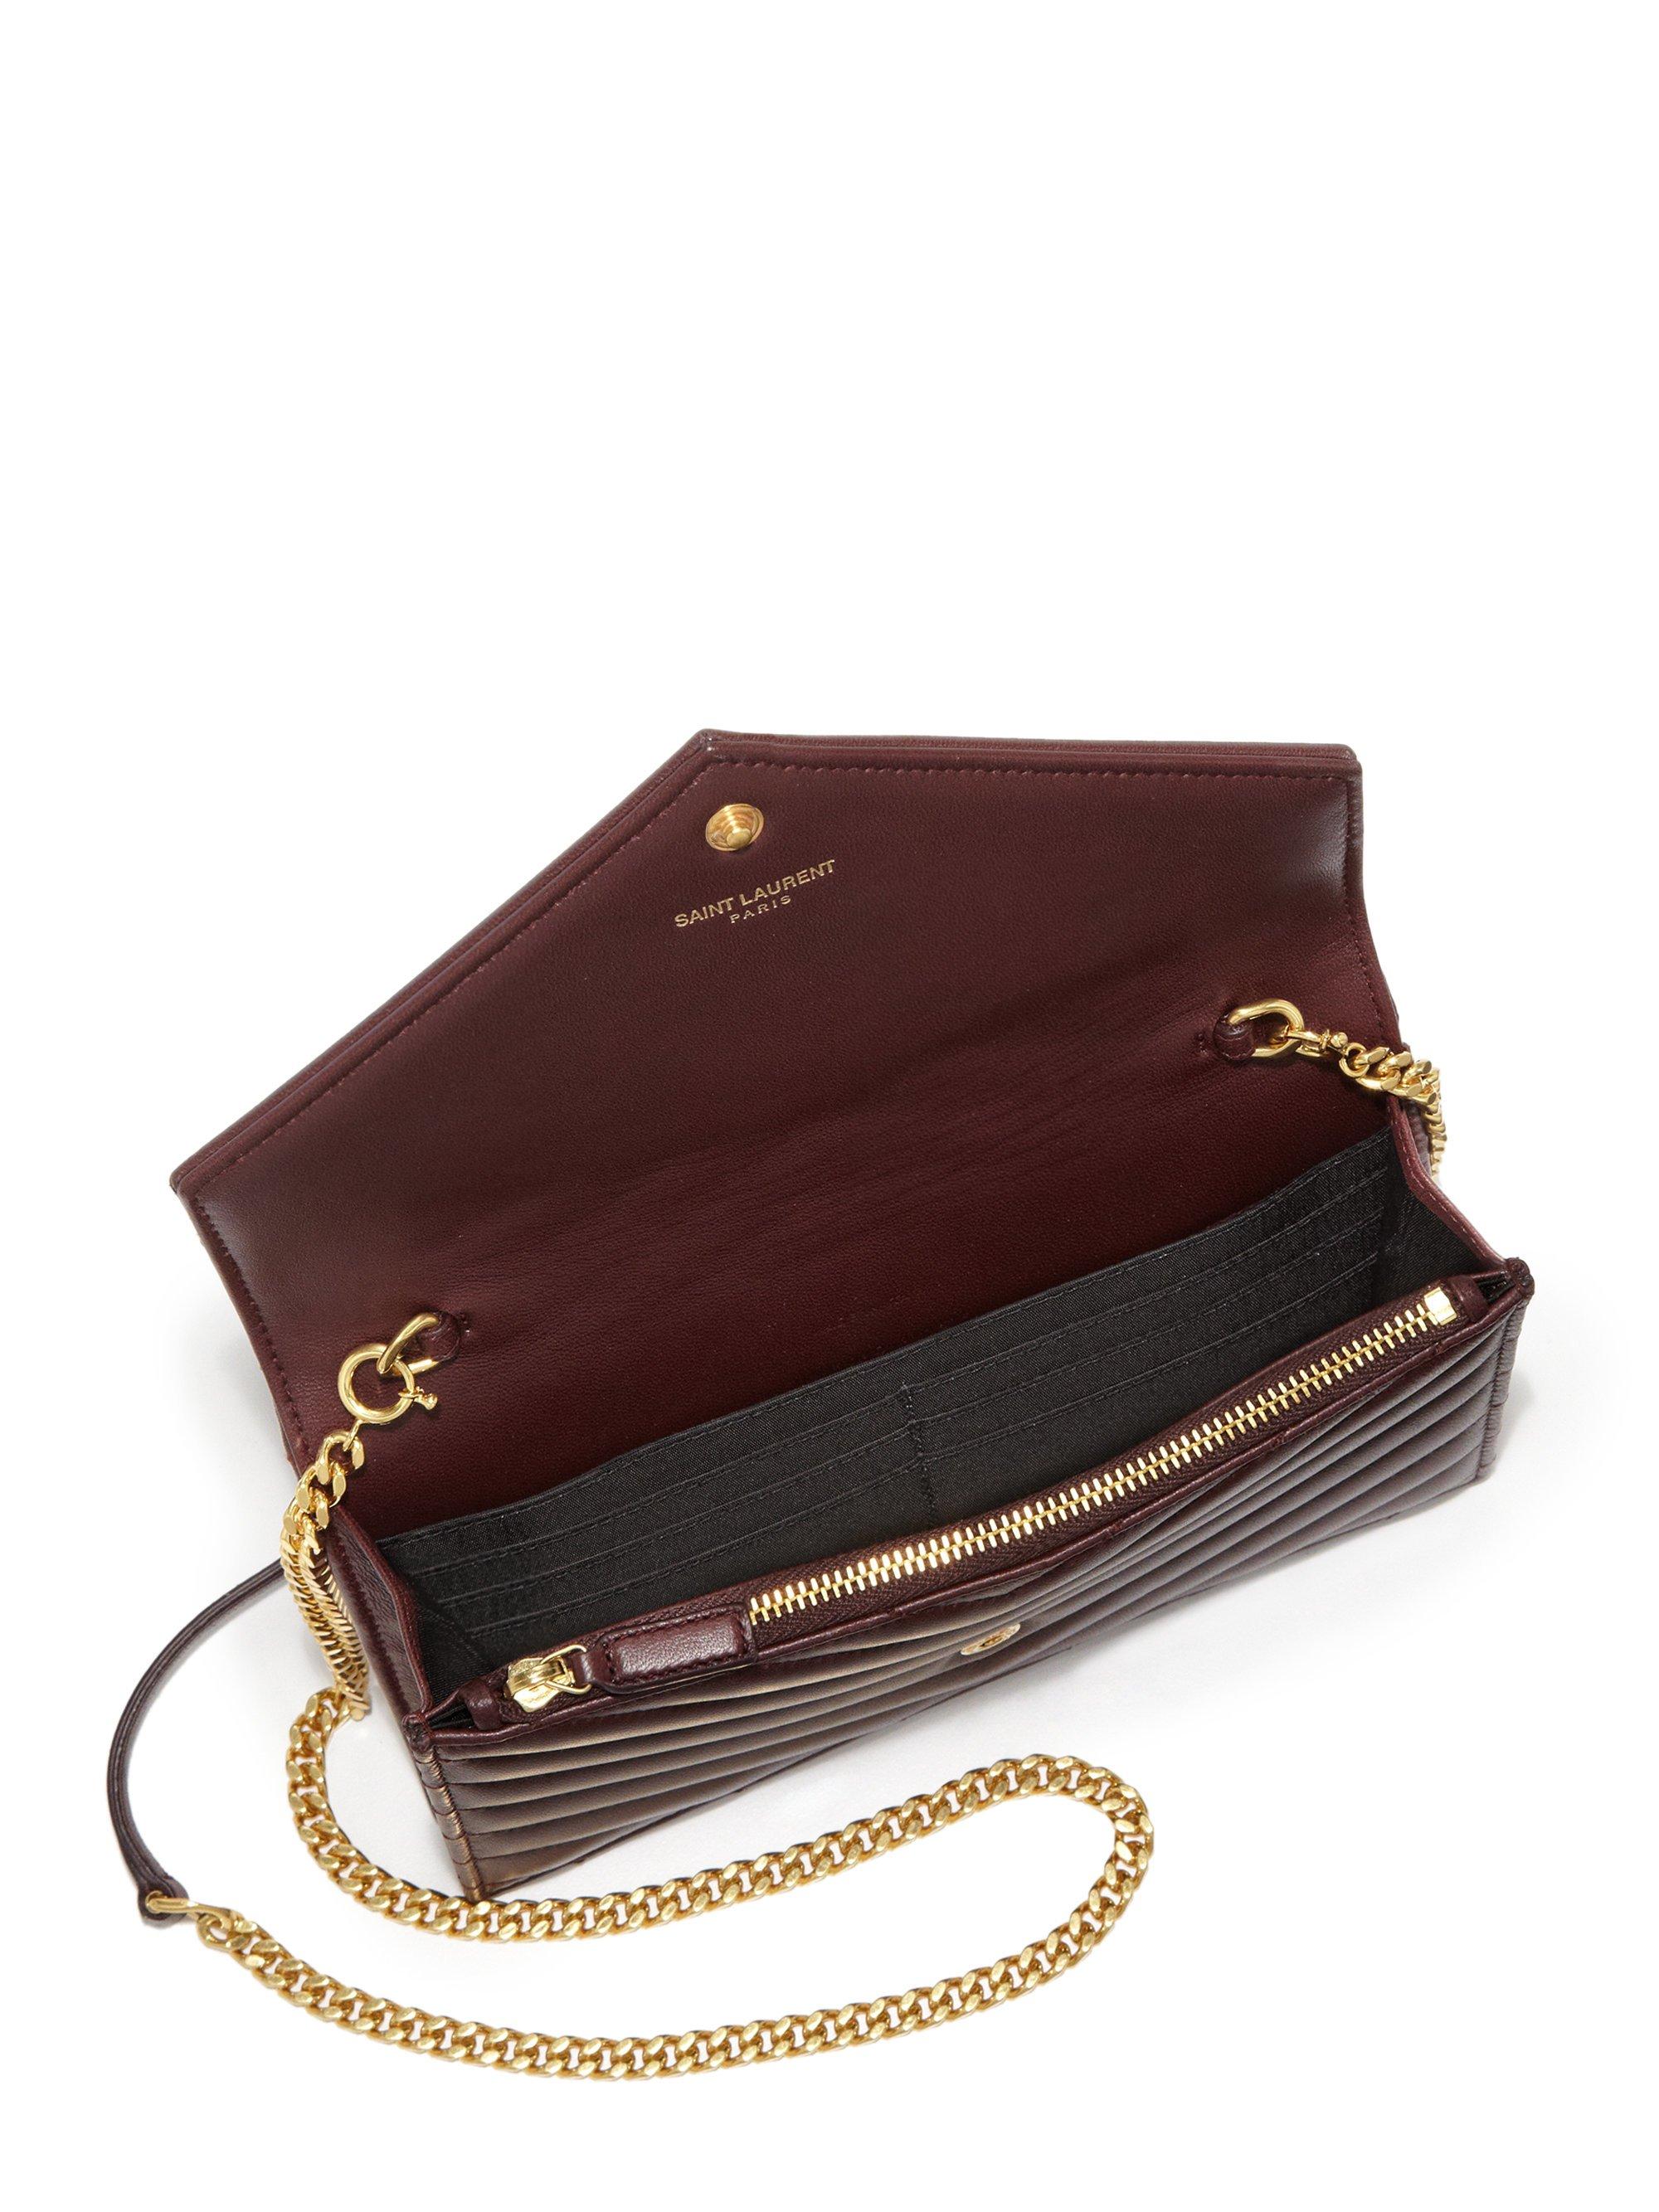 Lyst - Saint Laurent Monogramme Matelasse Leather Chain Wallet in Purple da1a225eee